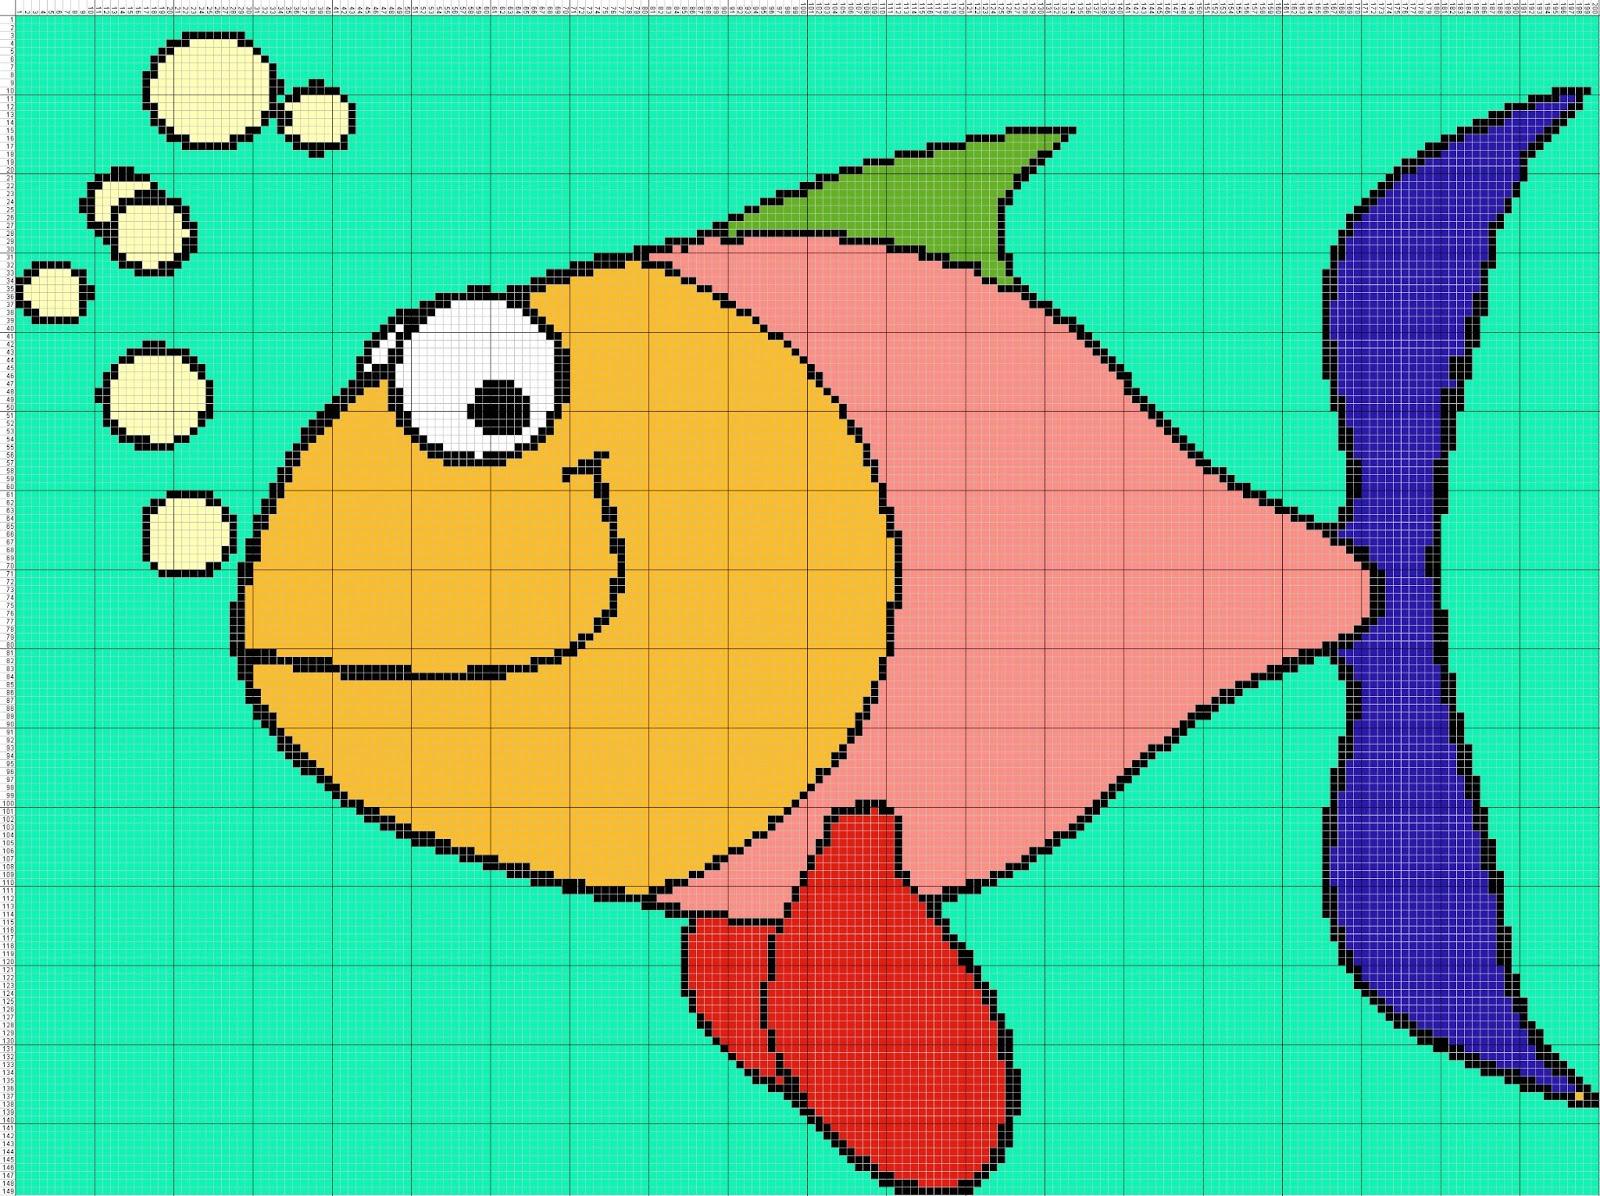 Gambar pola kristik ikan lucu warna-warni